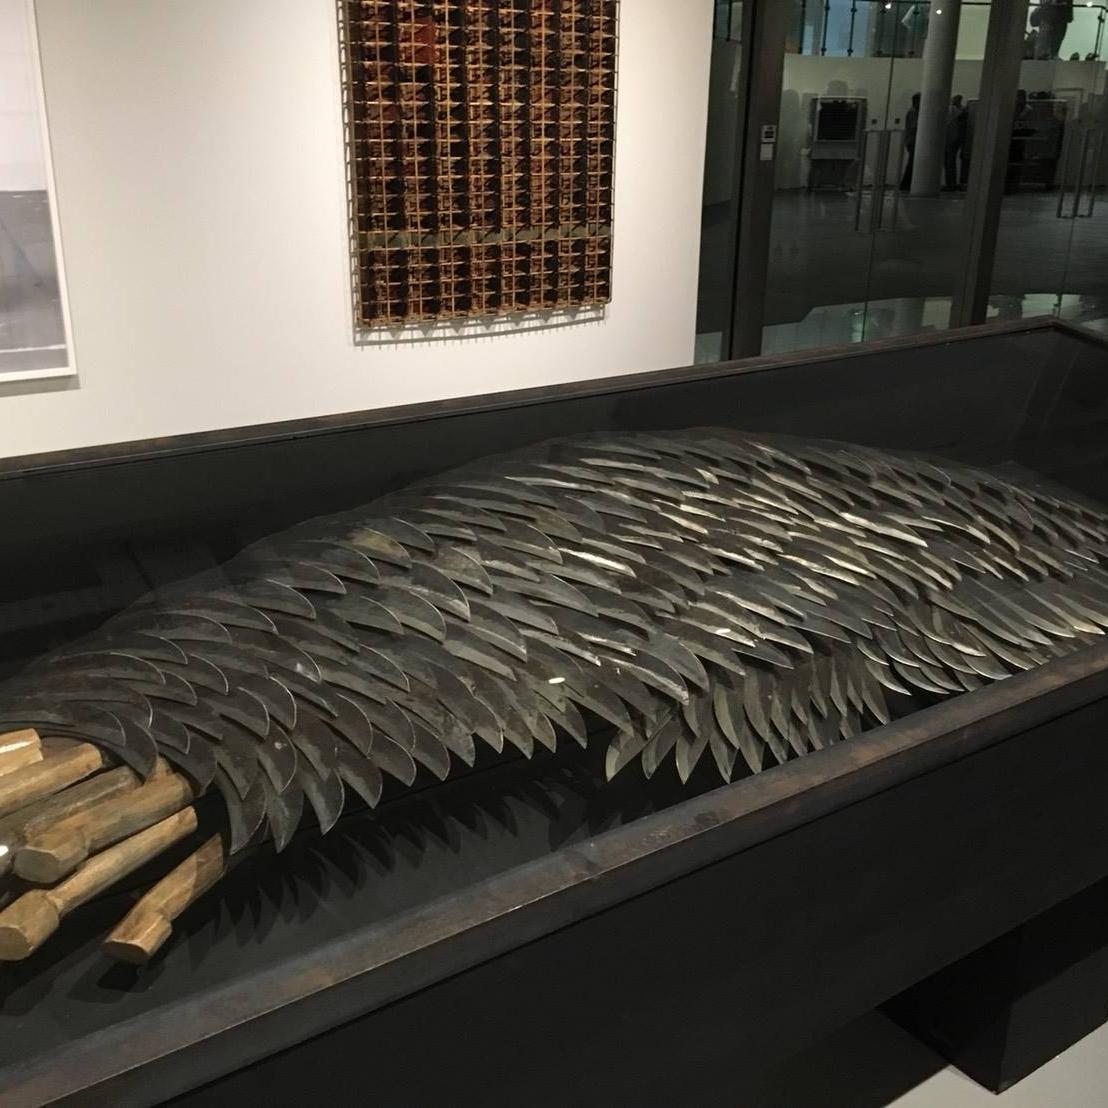 "阿奎禮讚夫婦的「左翼計畫」作品:2018.07.21 - 10.10 於新加坡拉薩爾藝術學院中展出  ""The Left Wing Project"" : 2018.07.21 - 10.10 in Lasalle College of the Arts"